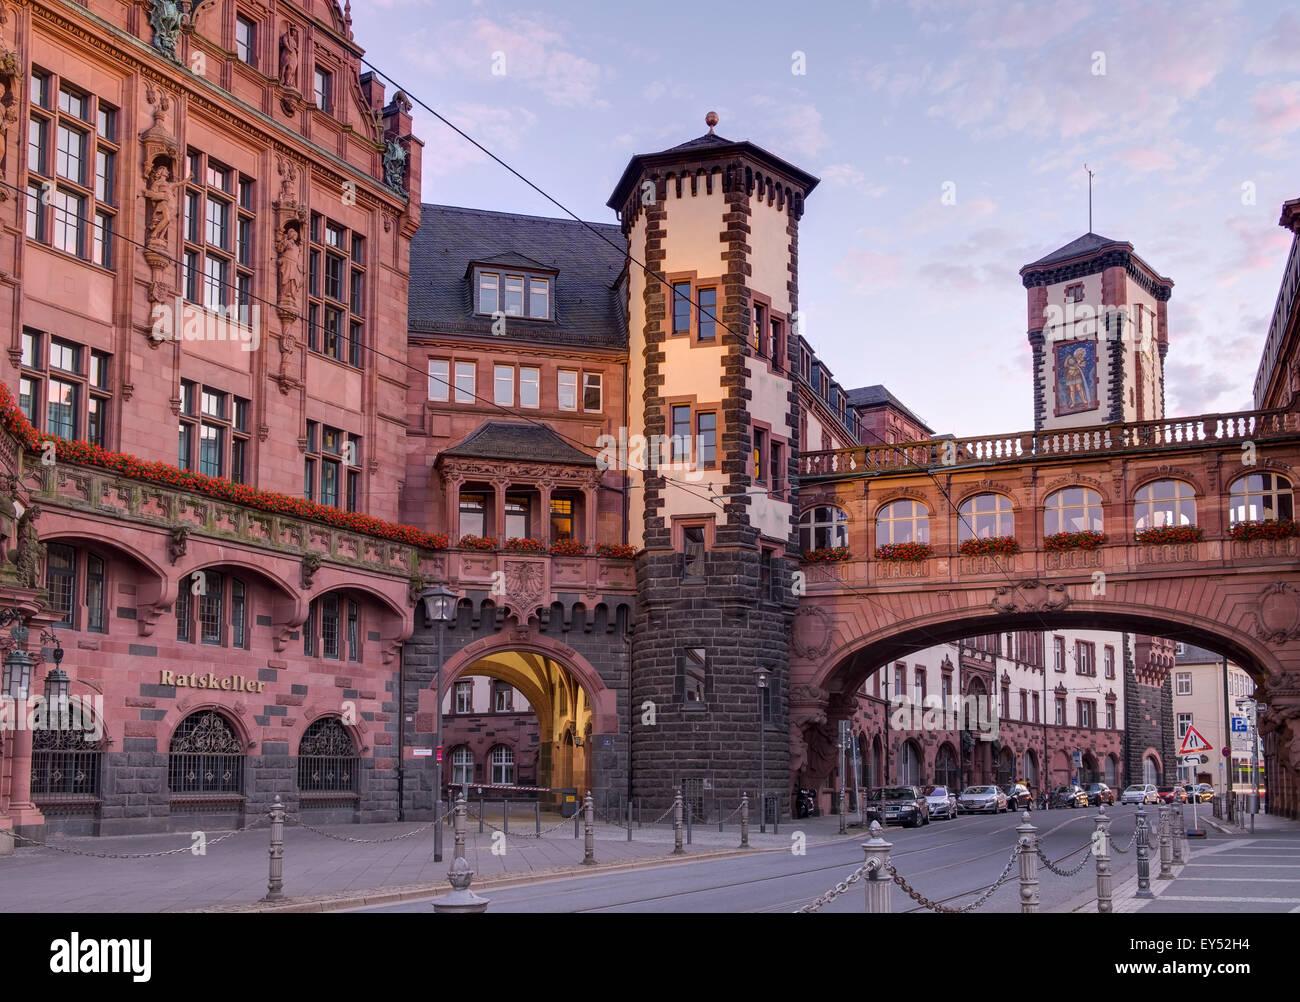 Römer building and Seufzerbrücke or Bridge of Sighs, historic centre, Frankfurt am Main, Hesse, Germany - Stock Image